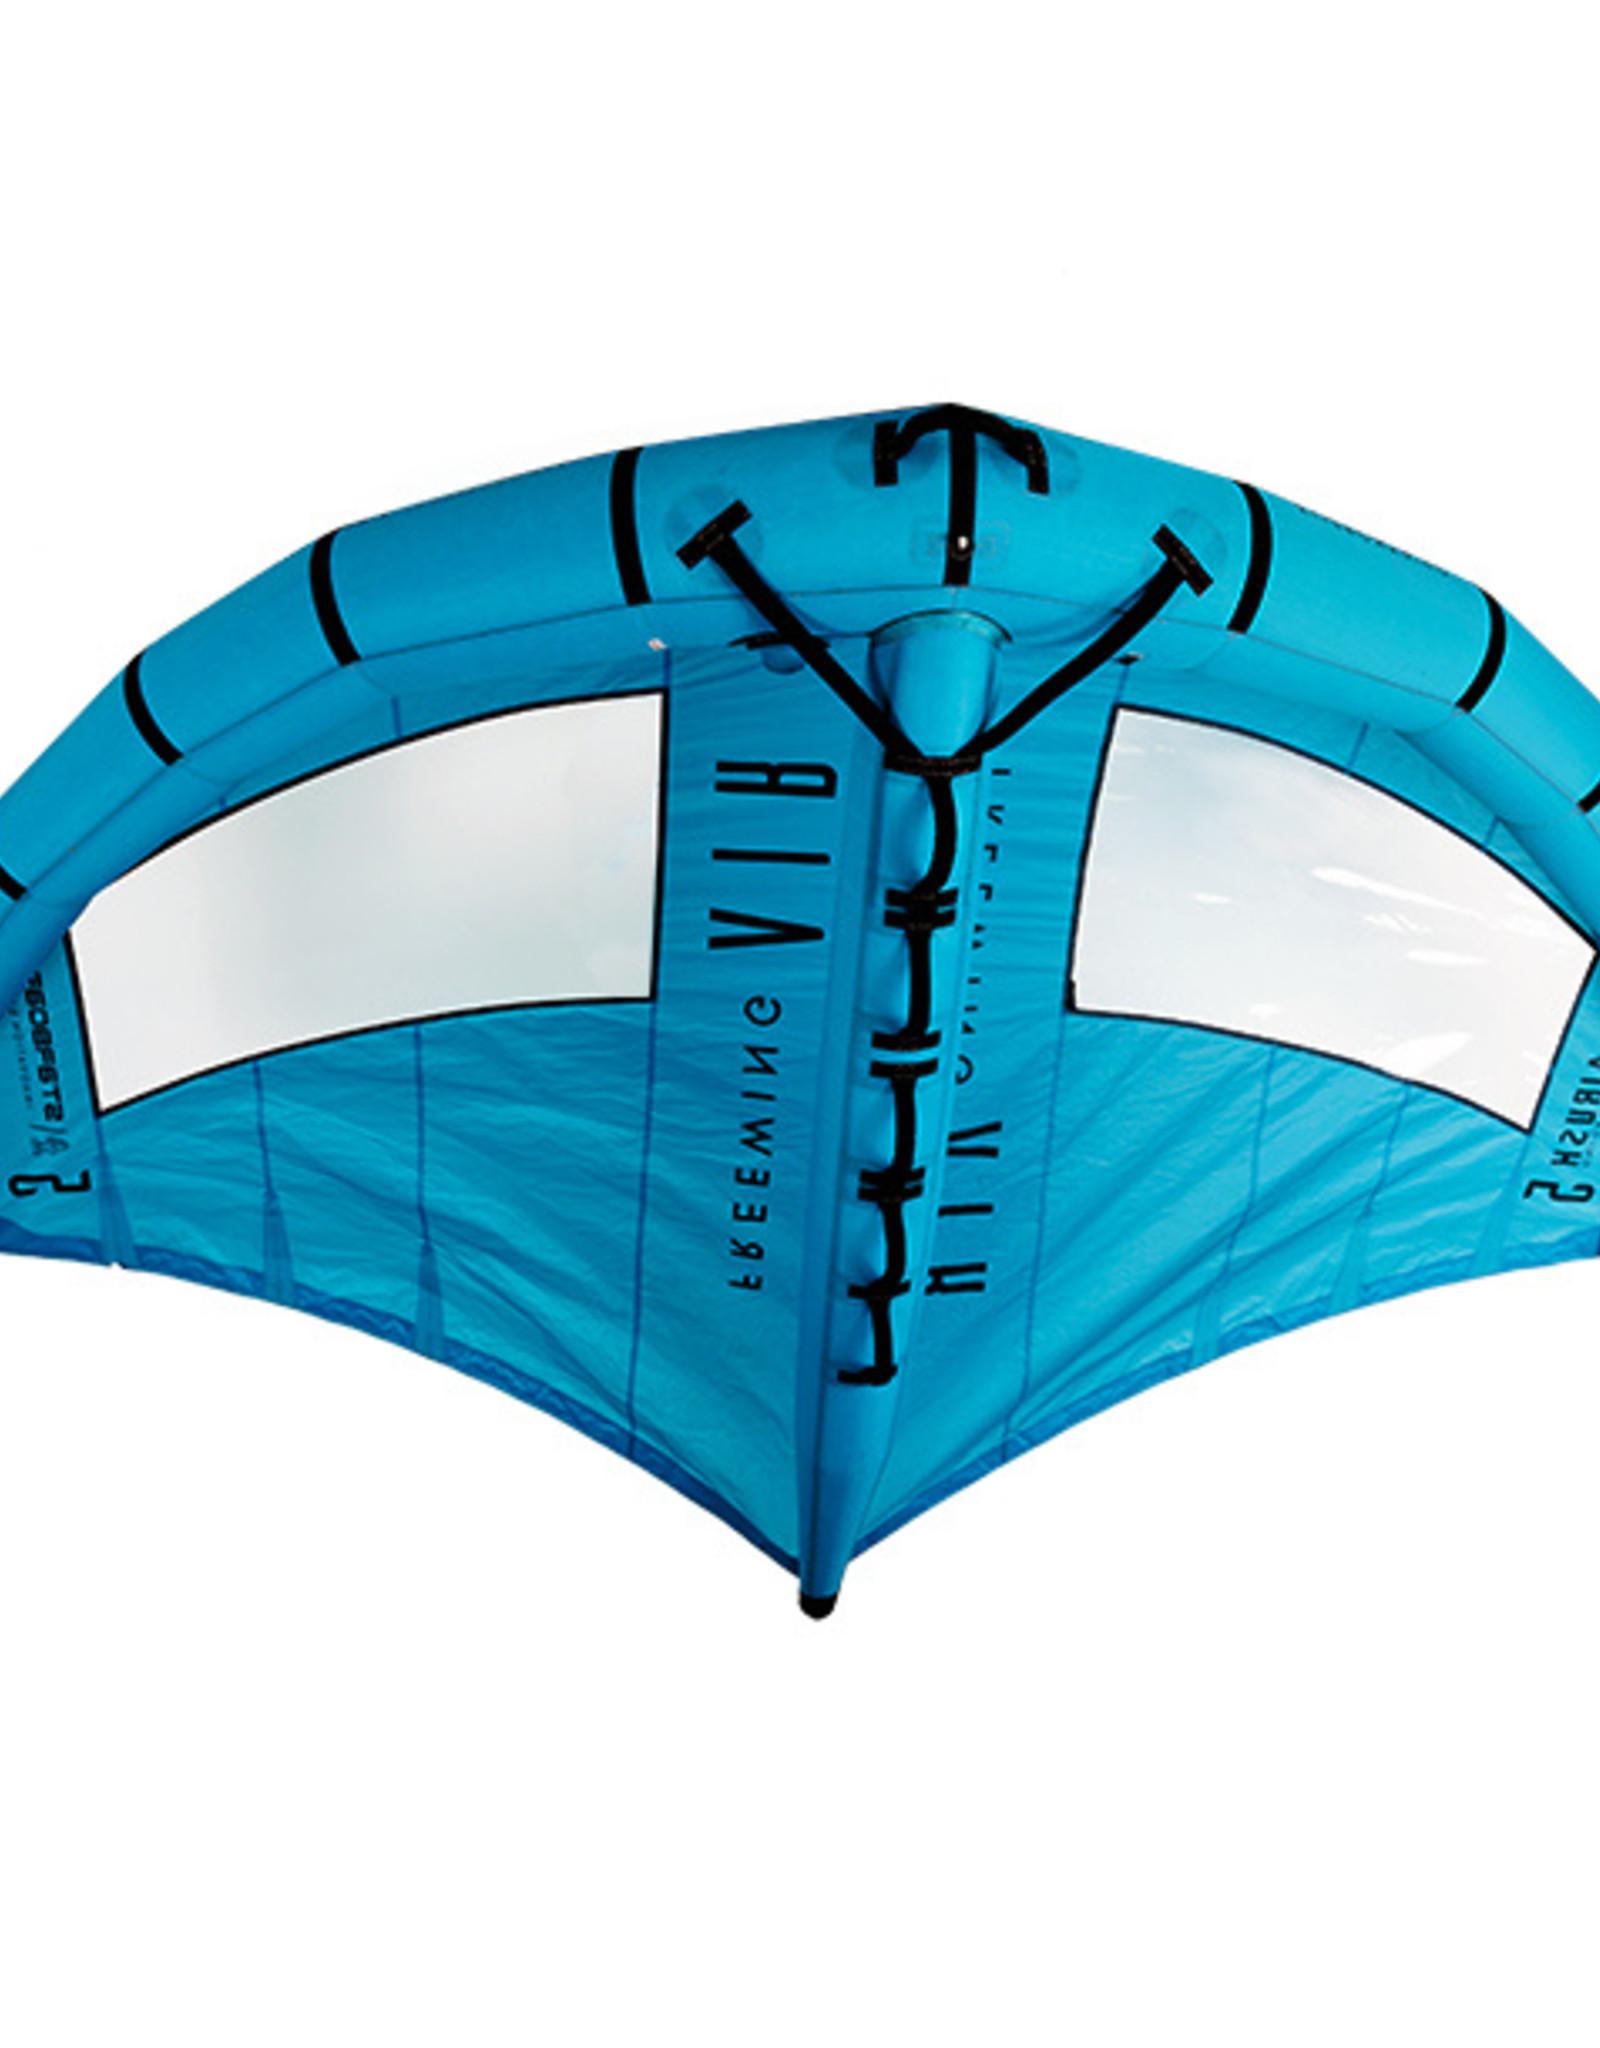 Airush STARBOARD AIRUSH FREEWING AIR 6M